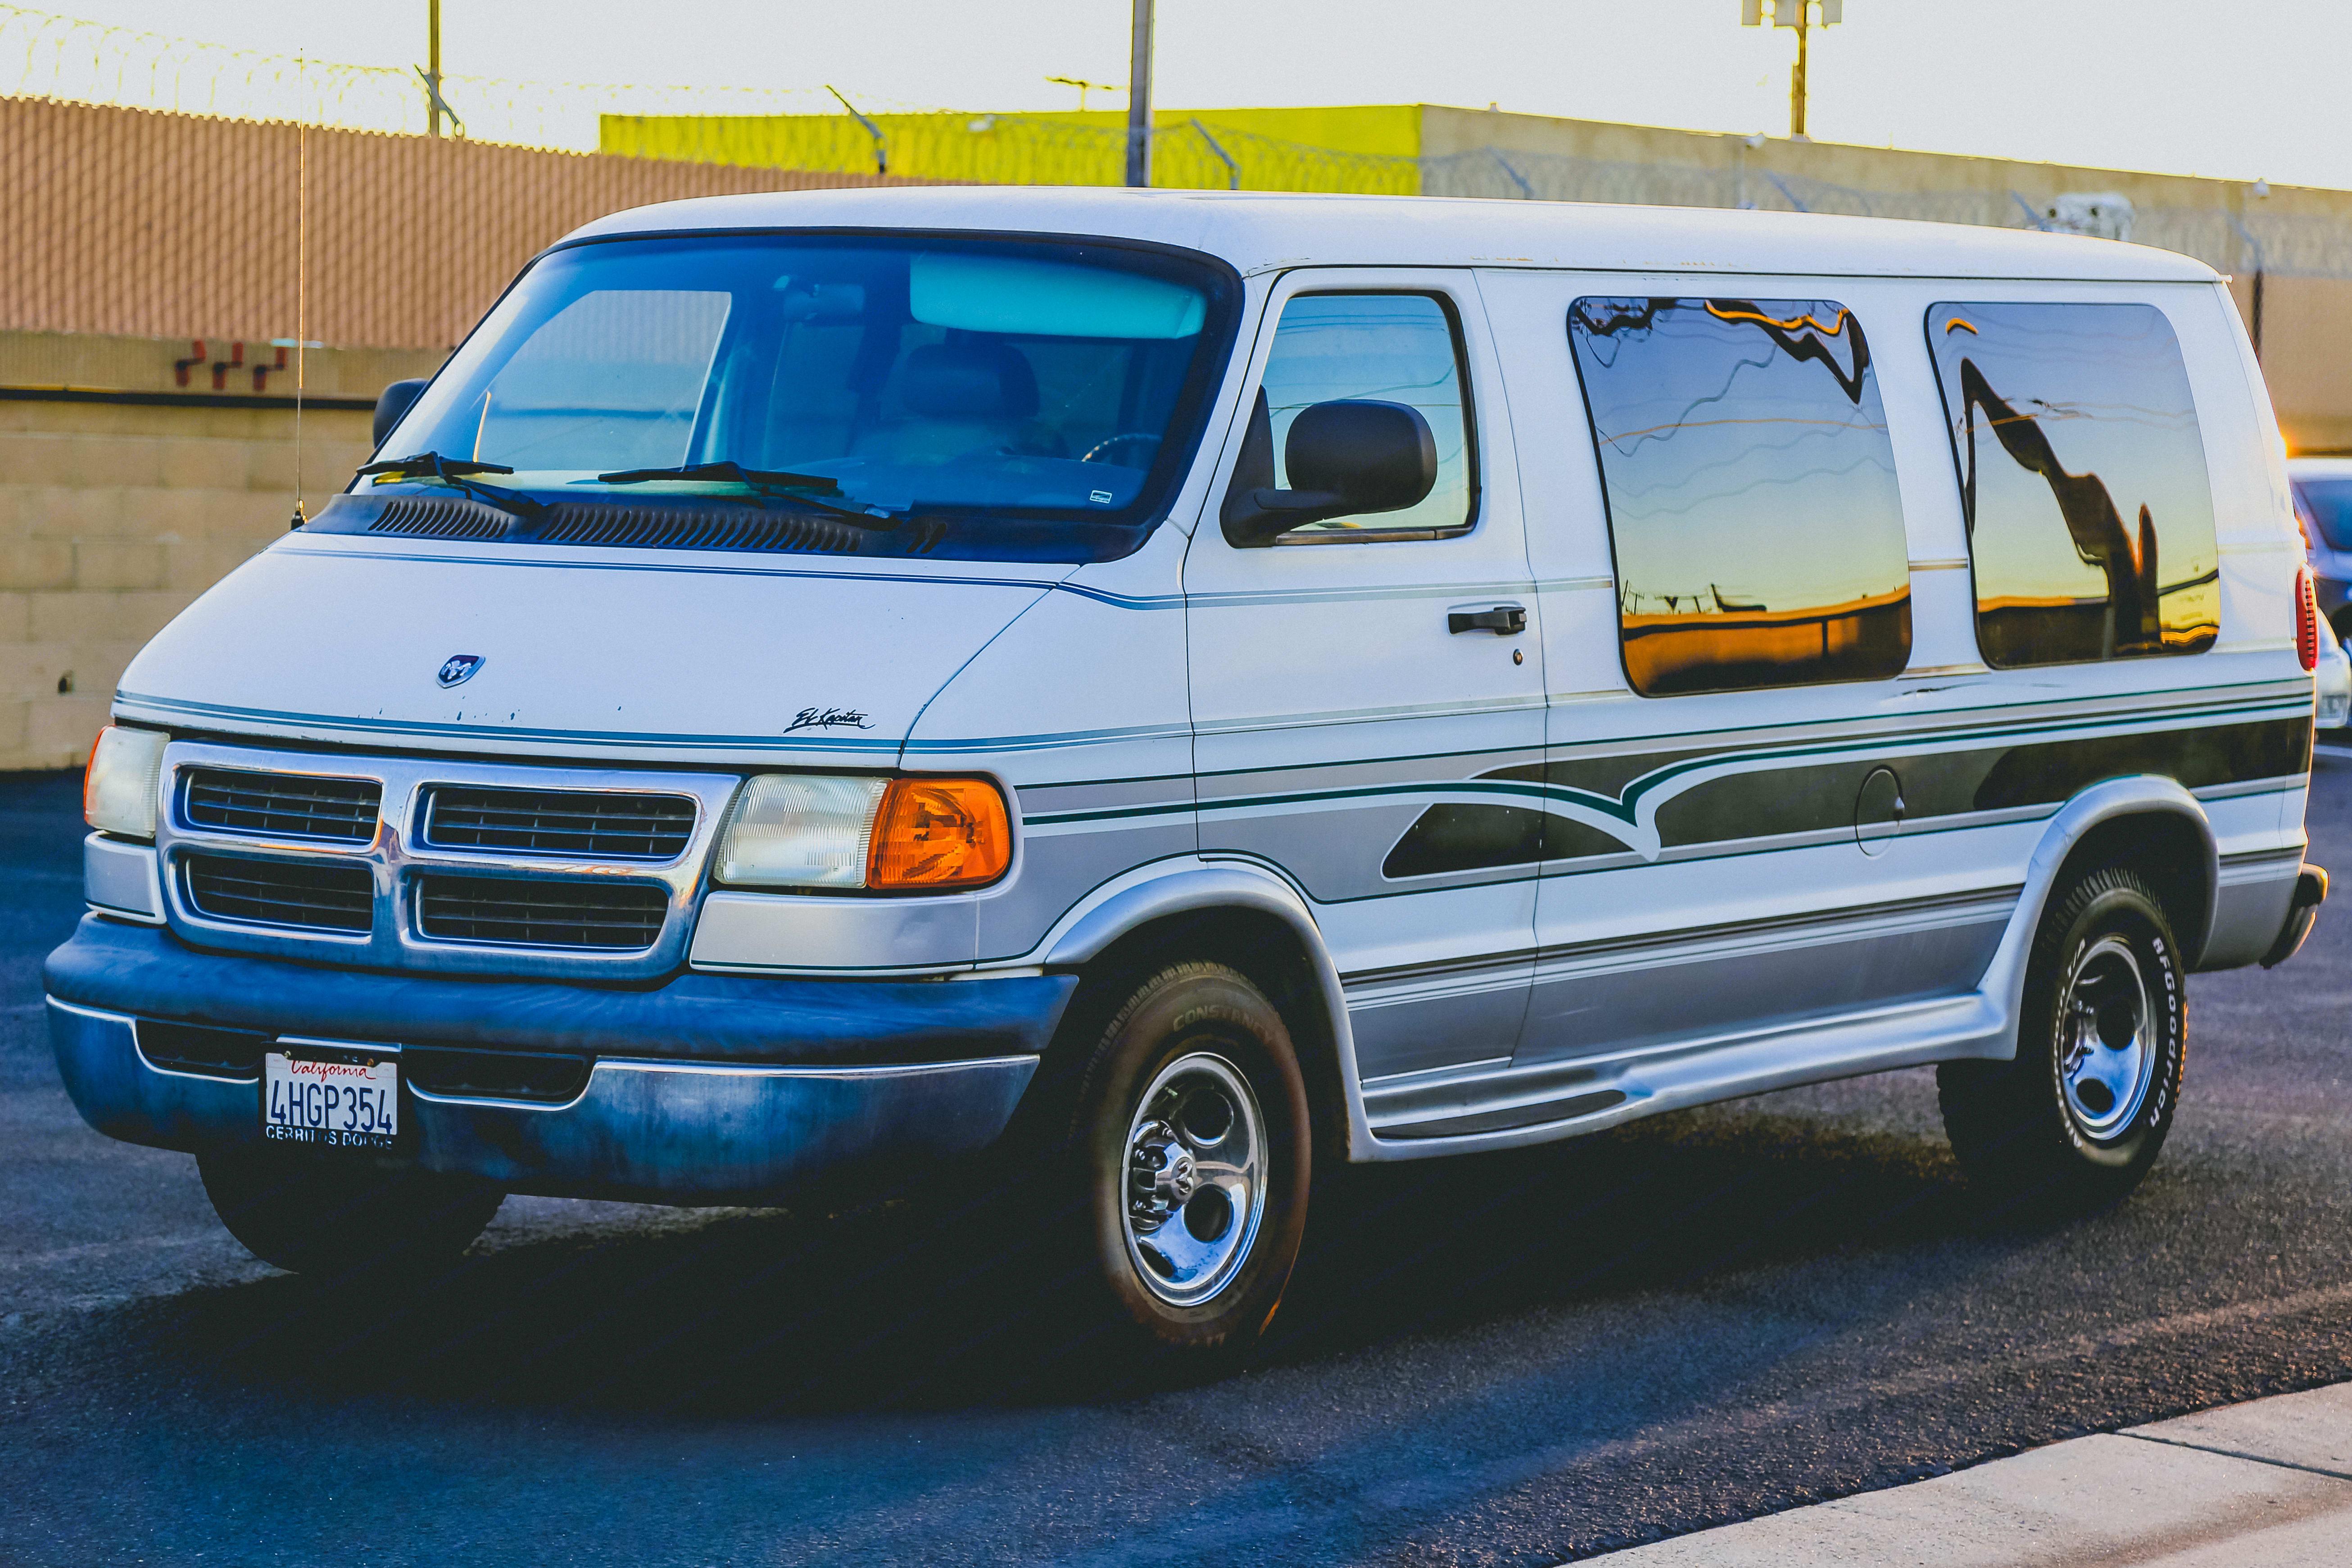 The most interesting camper van in the world! Meet El Kapitan himself affectionately named Hercules! . Dodge Ram 1500 1999